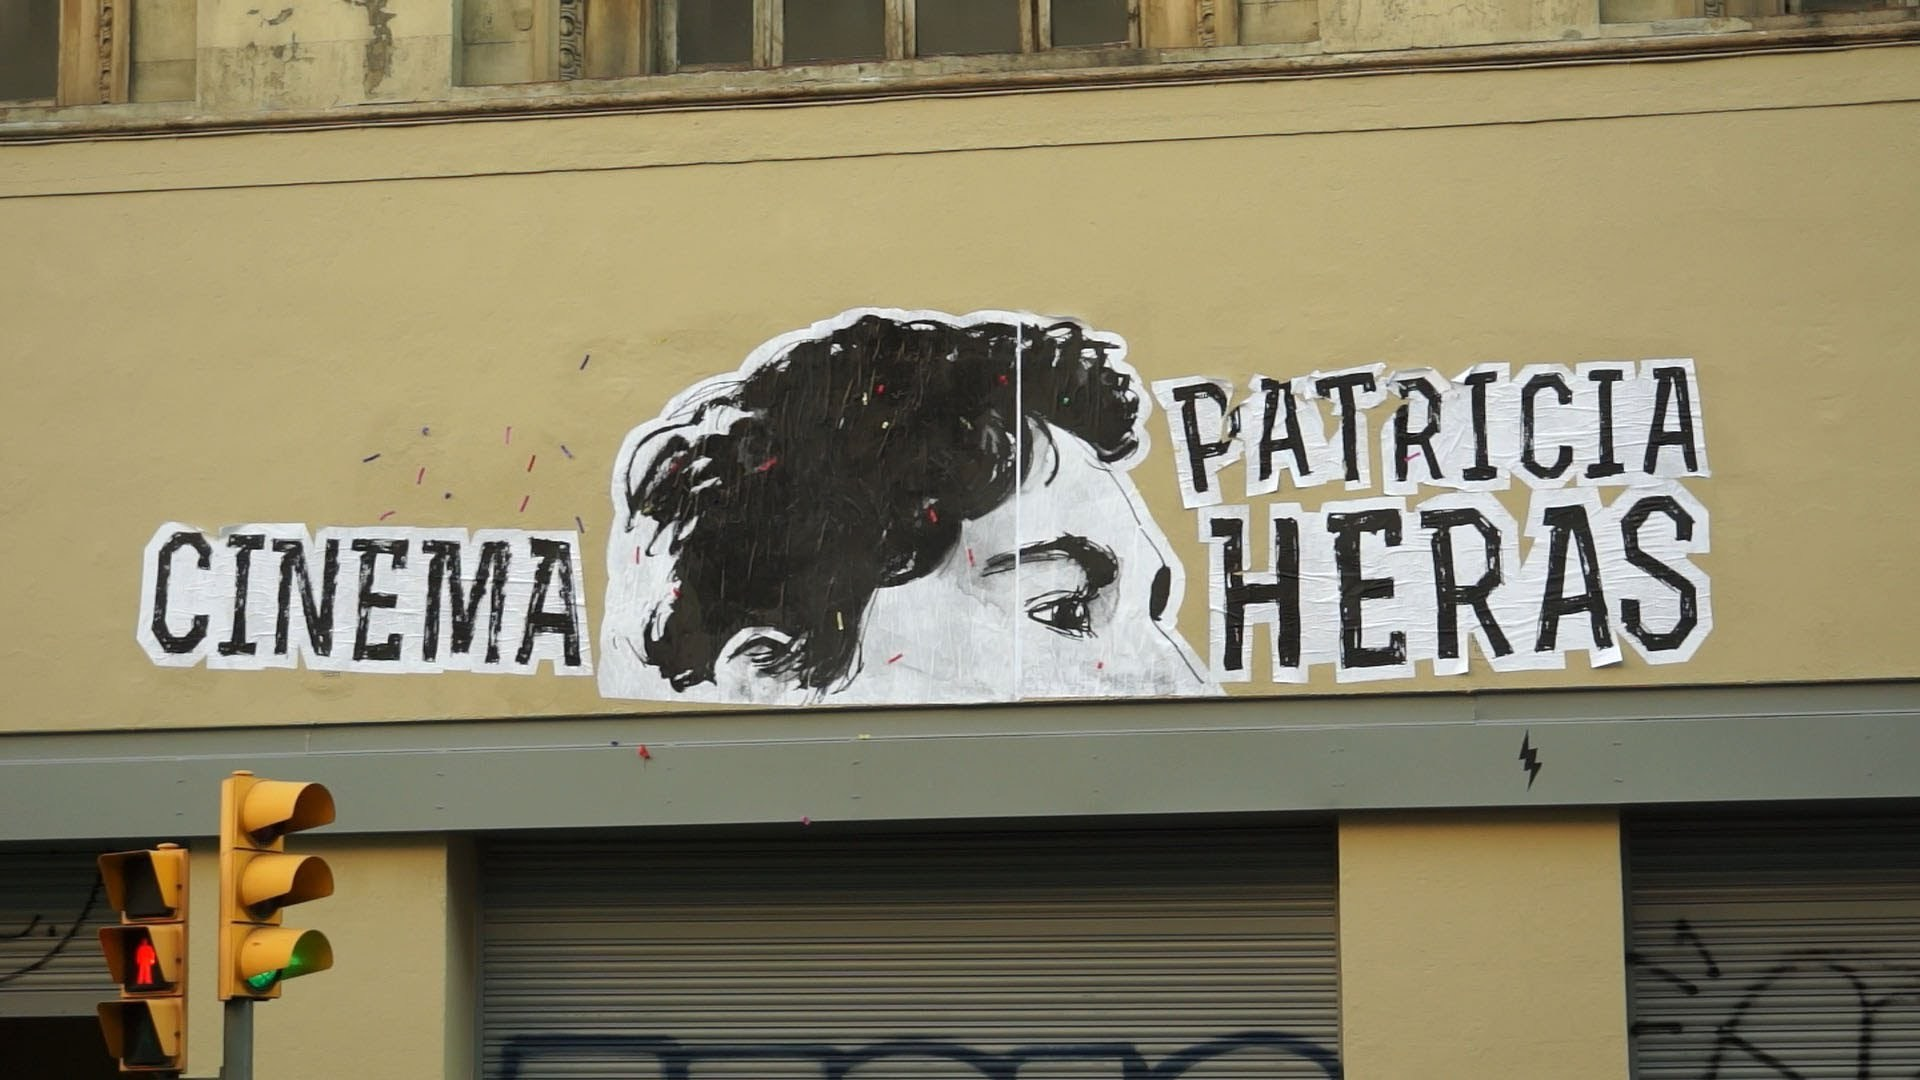 Cinema Patricia Heras